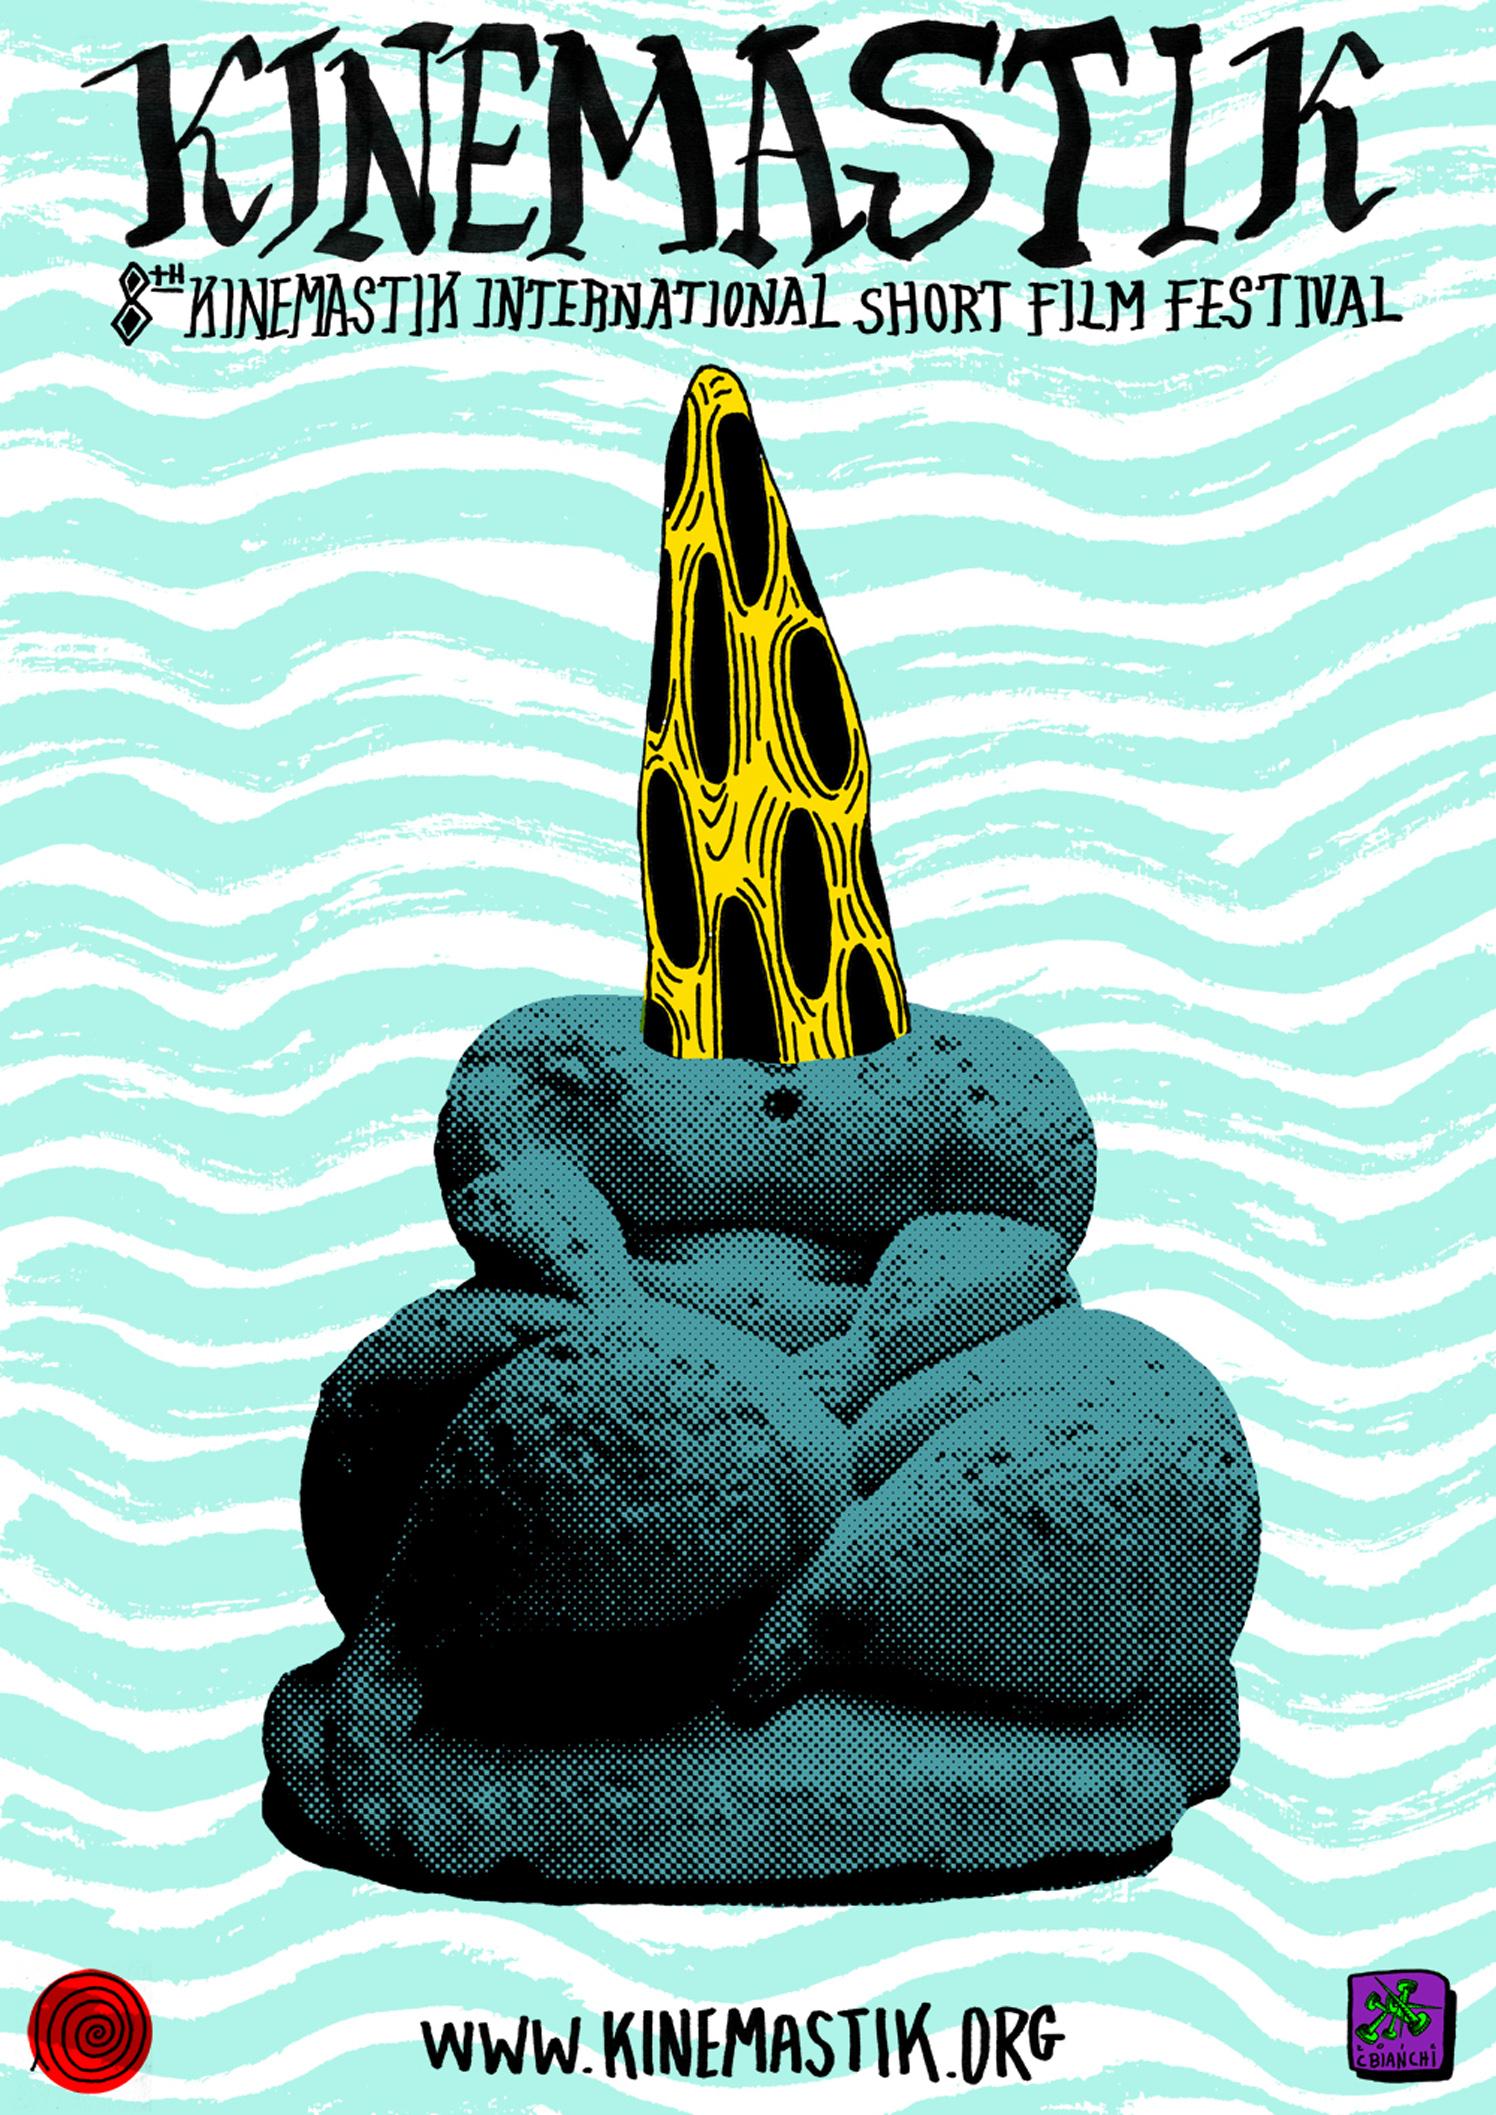 Kinemastik International Short Film Festival Poster